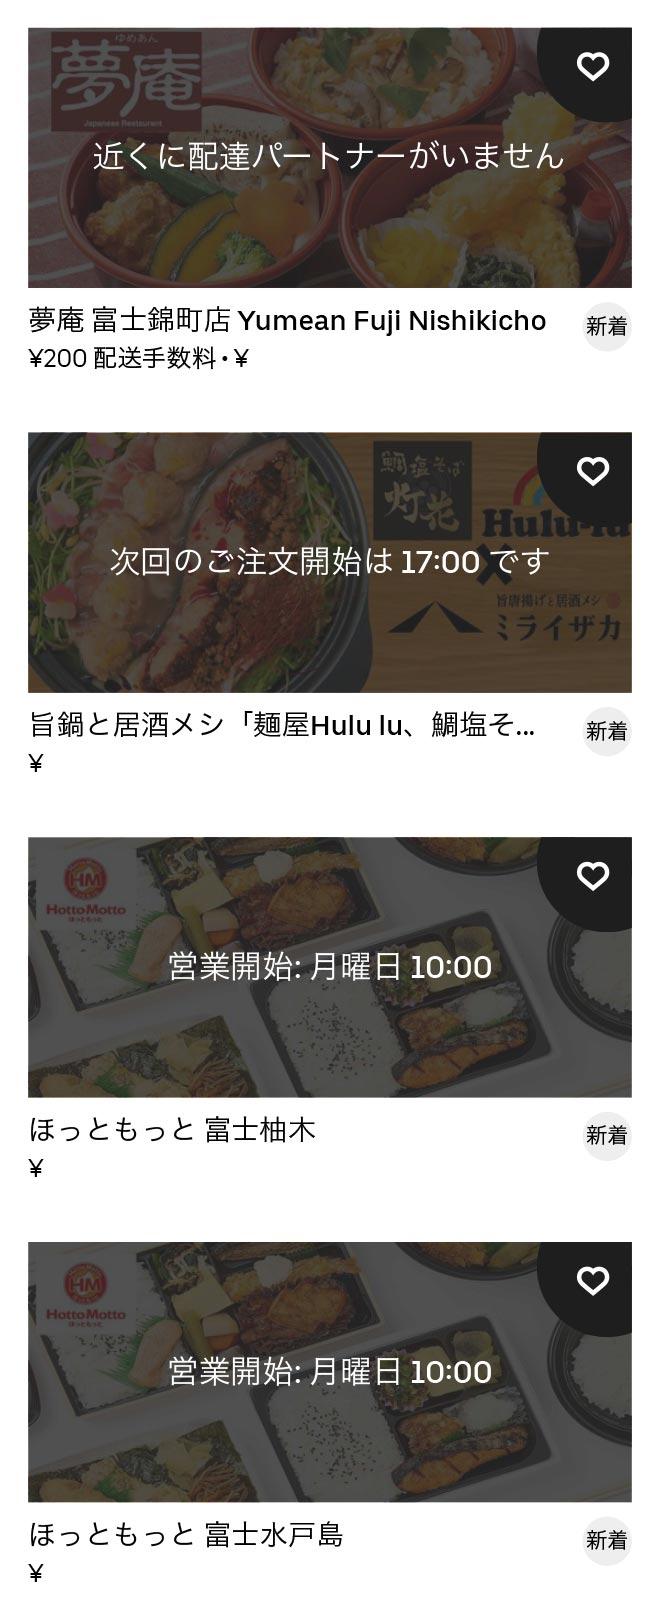 Fuji menu 2012 5